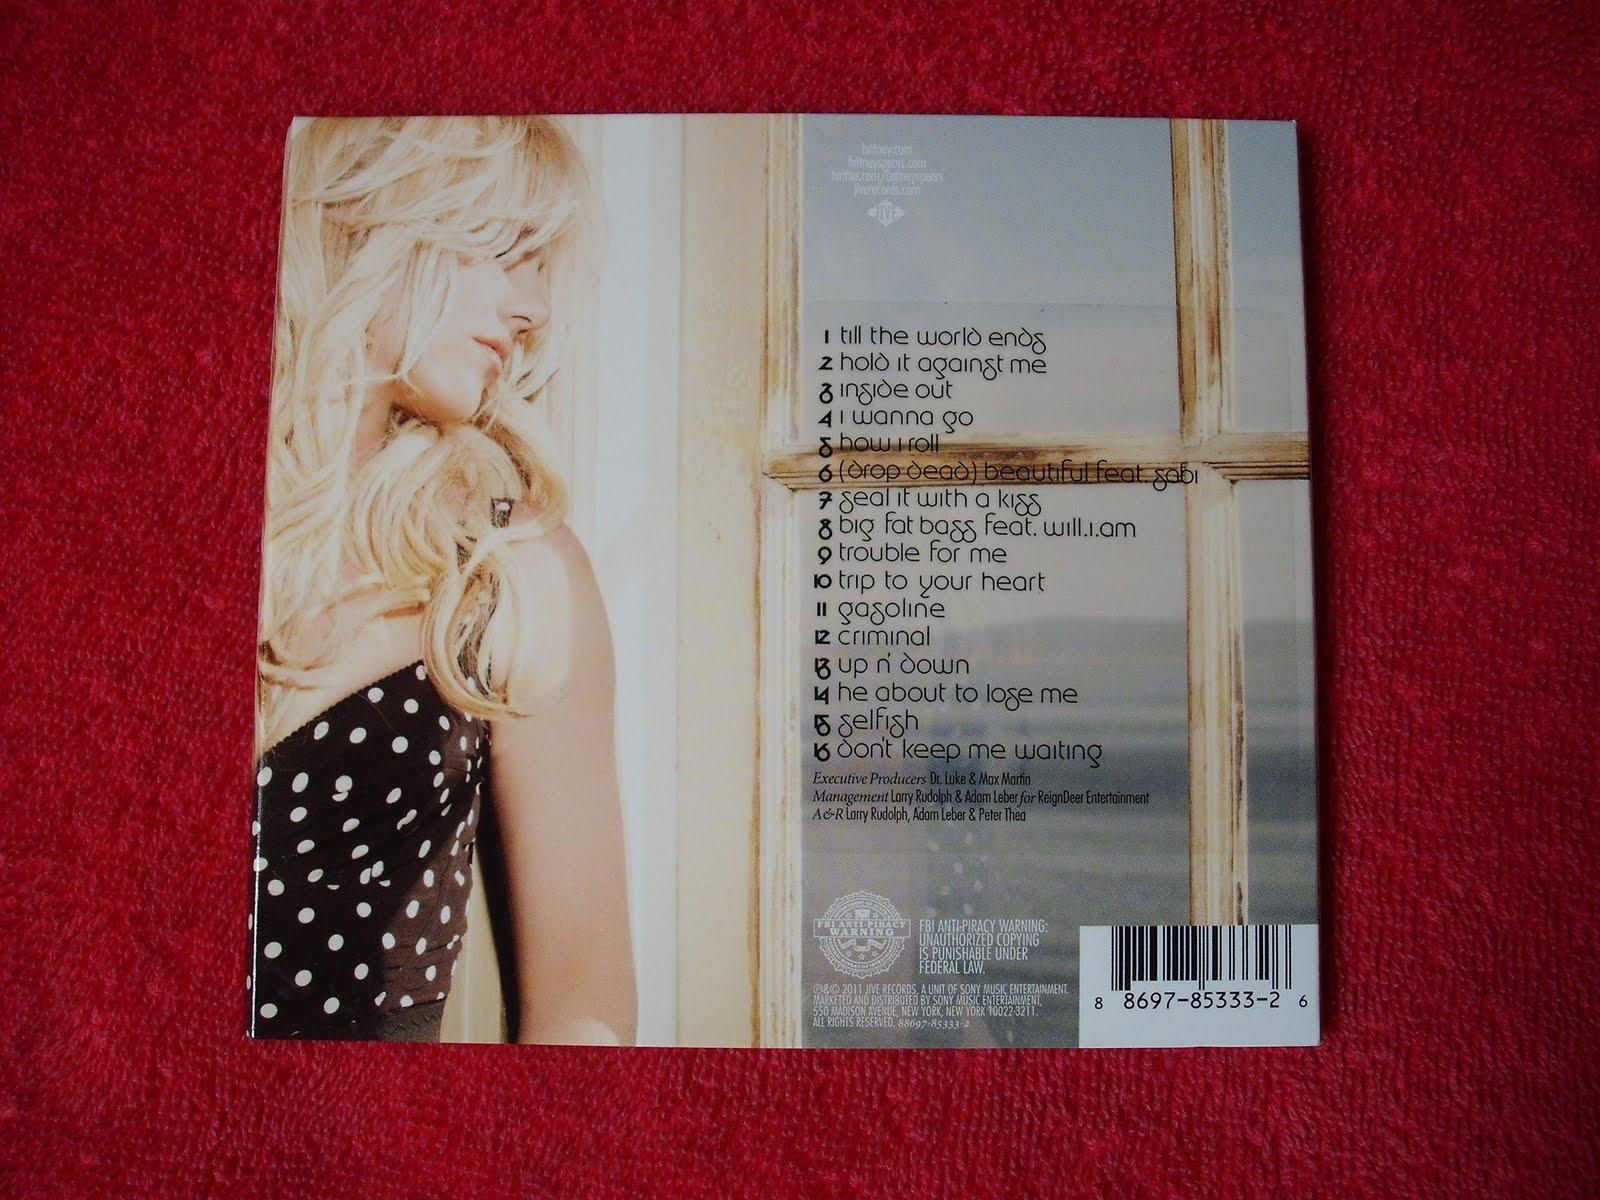 Britney Spears >> Tu colección de Britney Britney+Spears+Femme+Fatala+%25284%2529